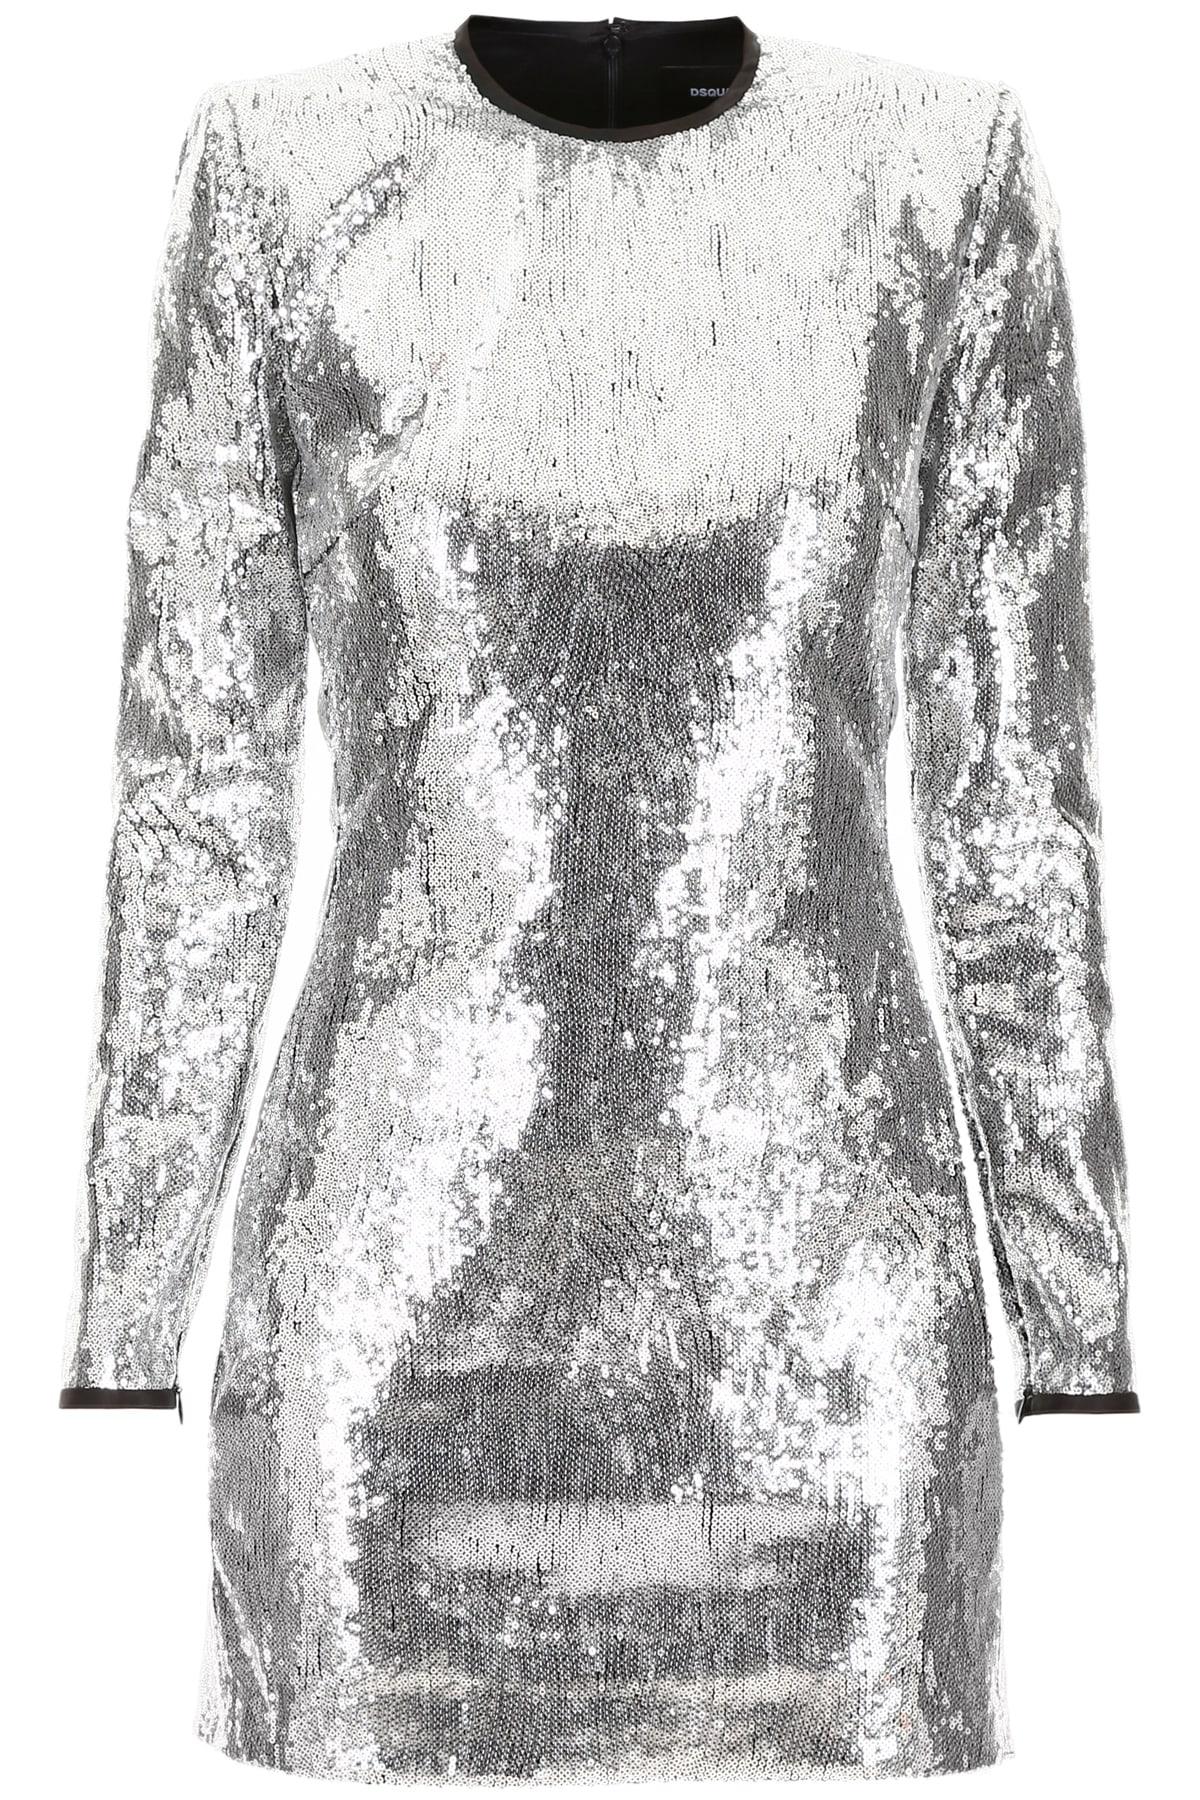 Dsquared2 Sequins Dress